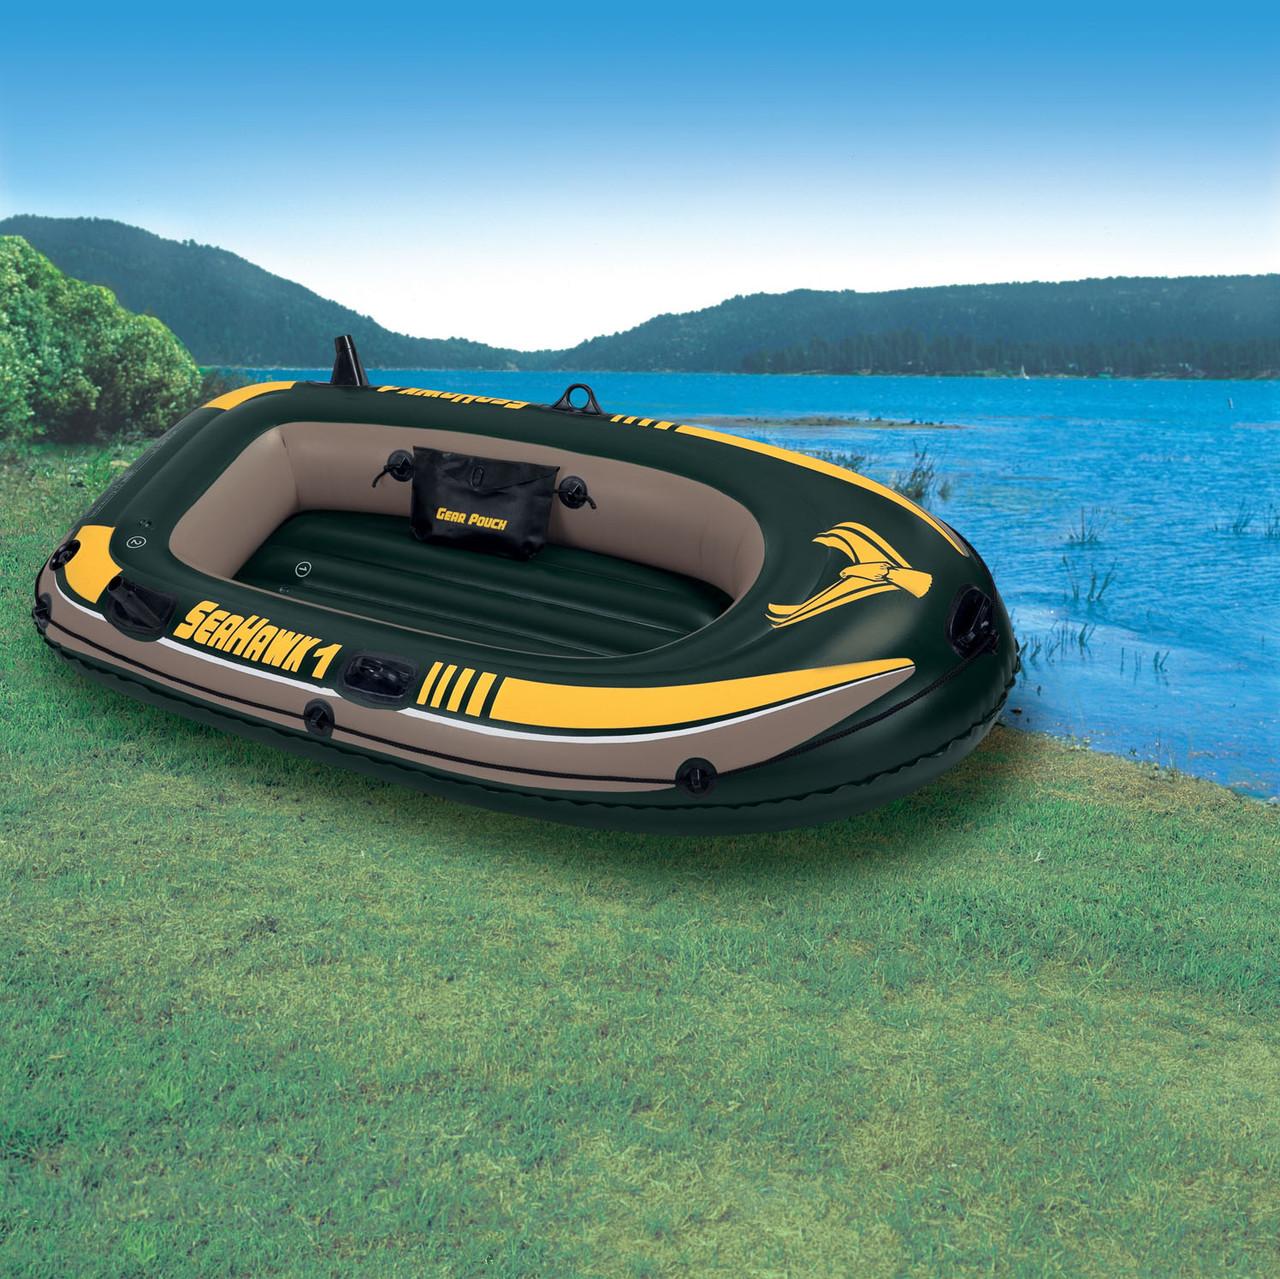 Лодка надувная SeaHawk 1 (193*108*38)